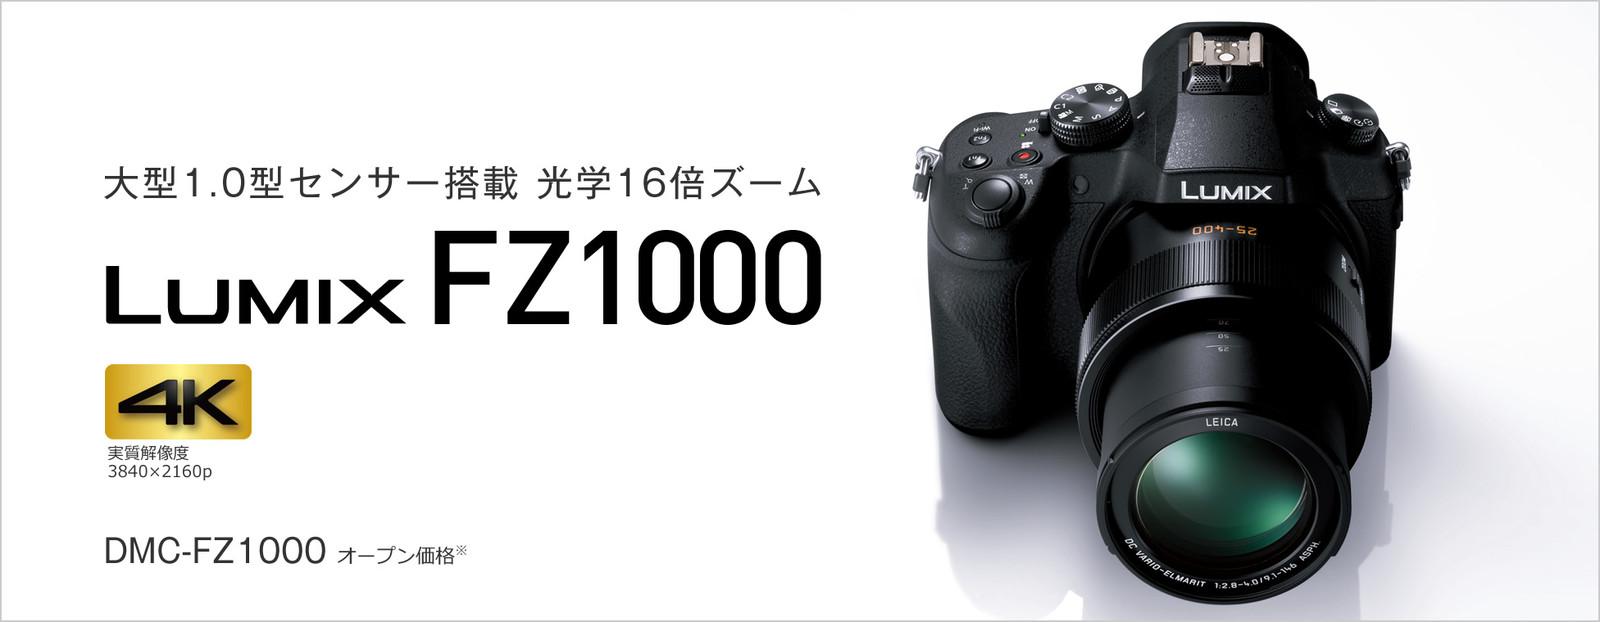 Fz1000_2